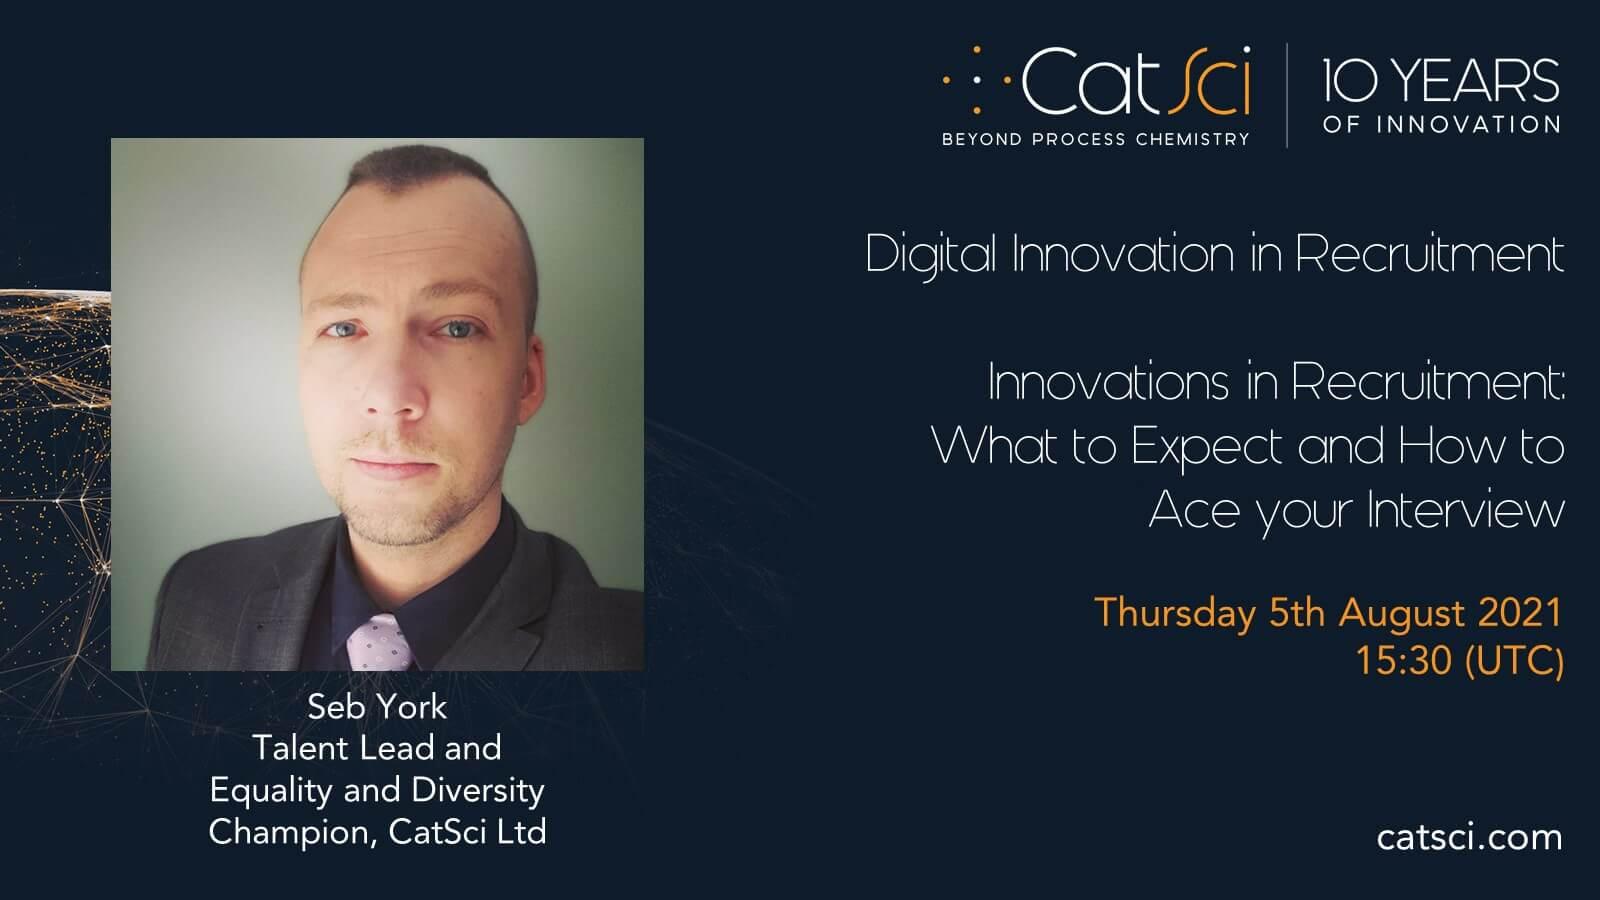 Digital Innovation in Recruitment